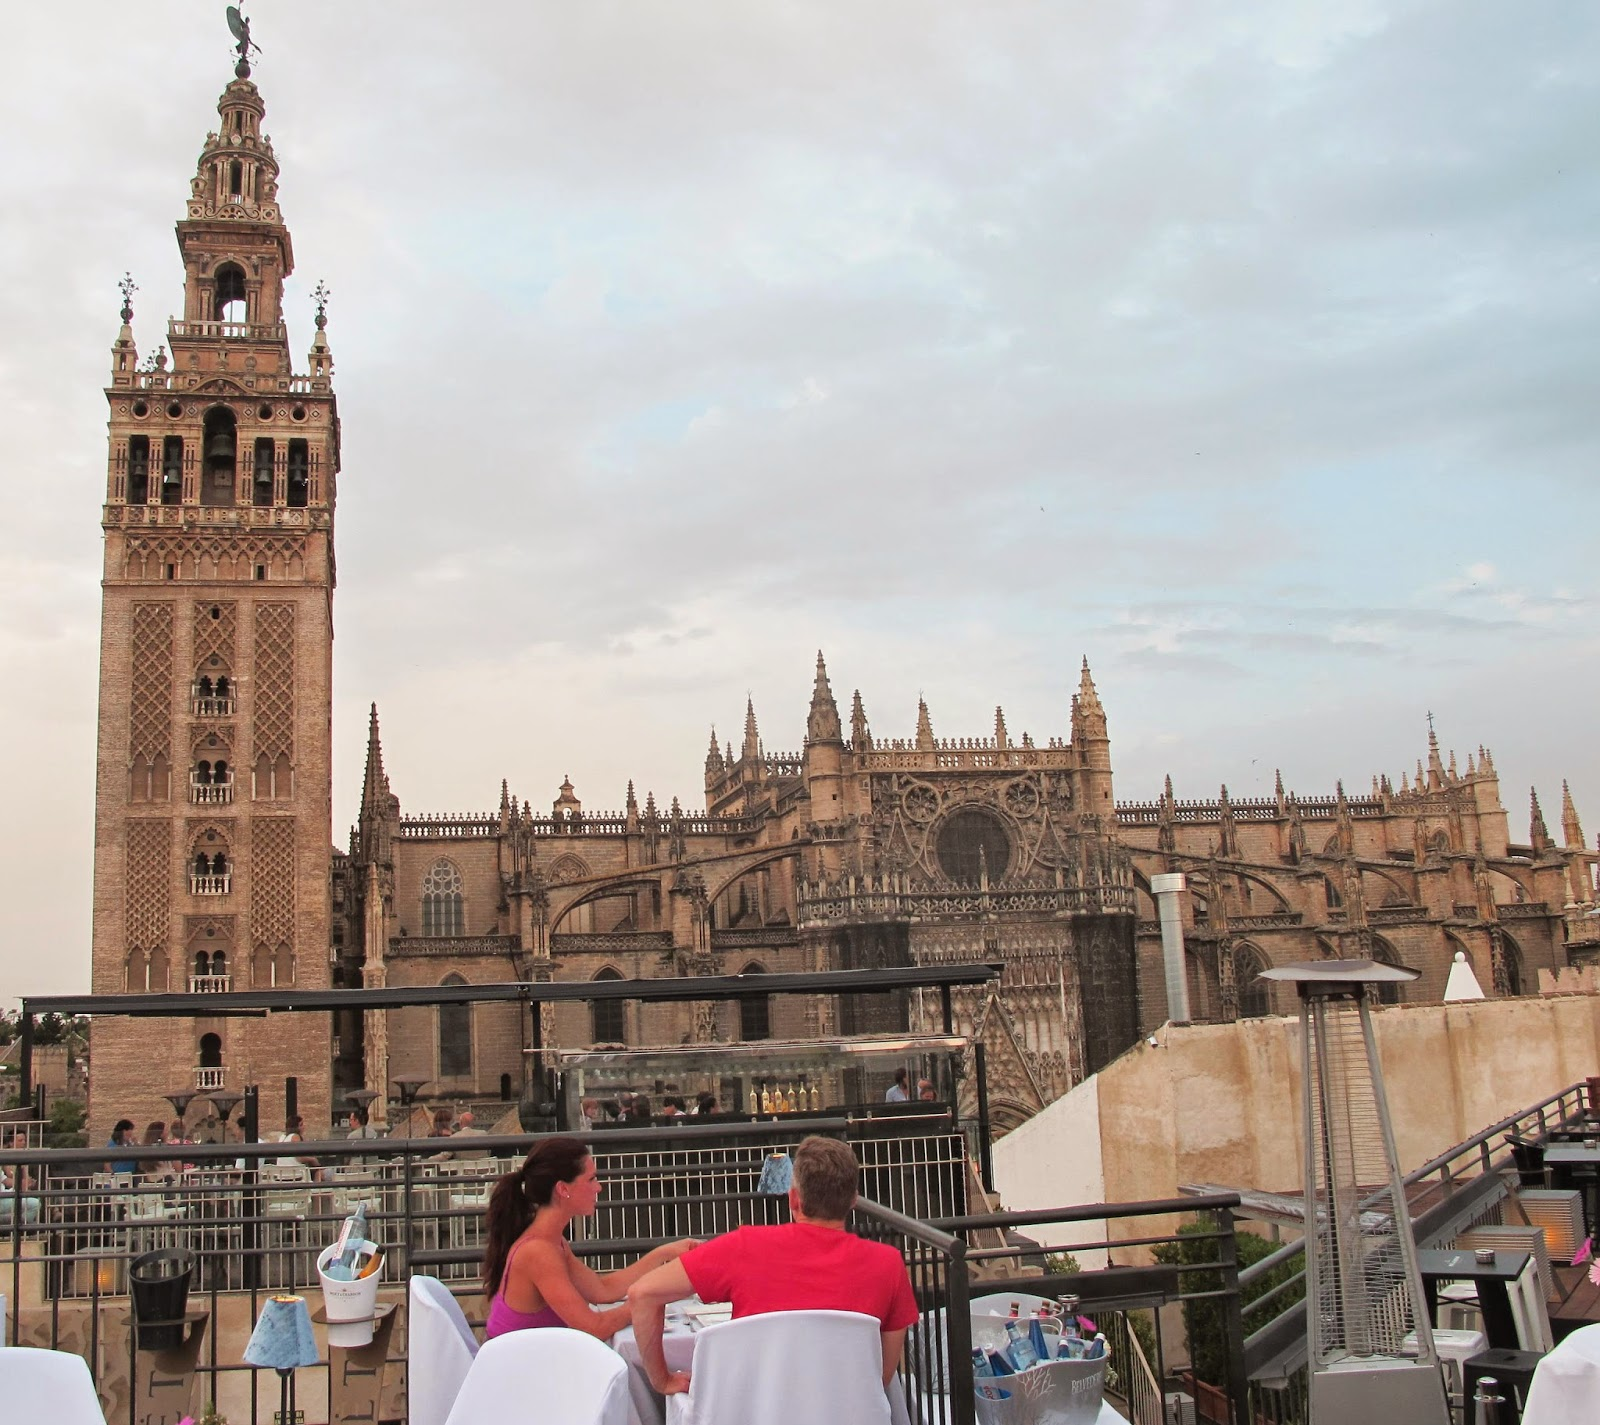 Restaurante panor mico la terraza de eme experiencia gourmet en 360 eme catedral hotel - Terraza hotel eme ...